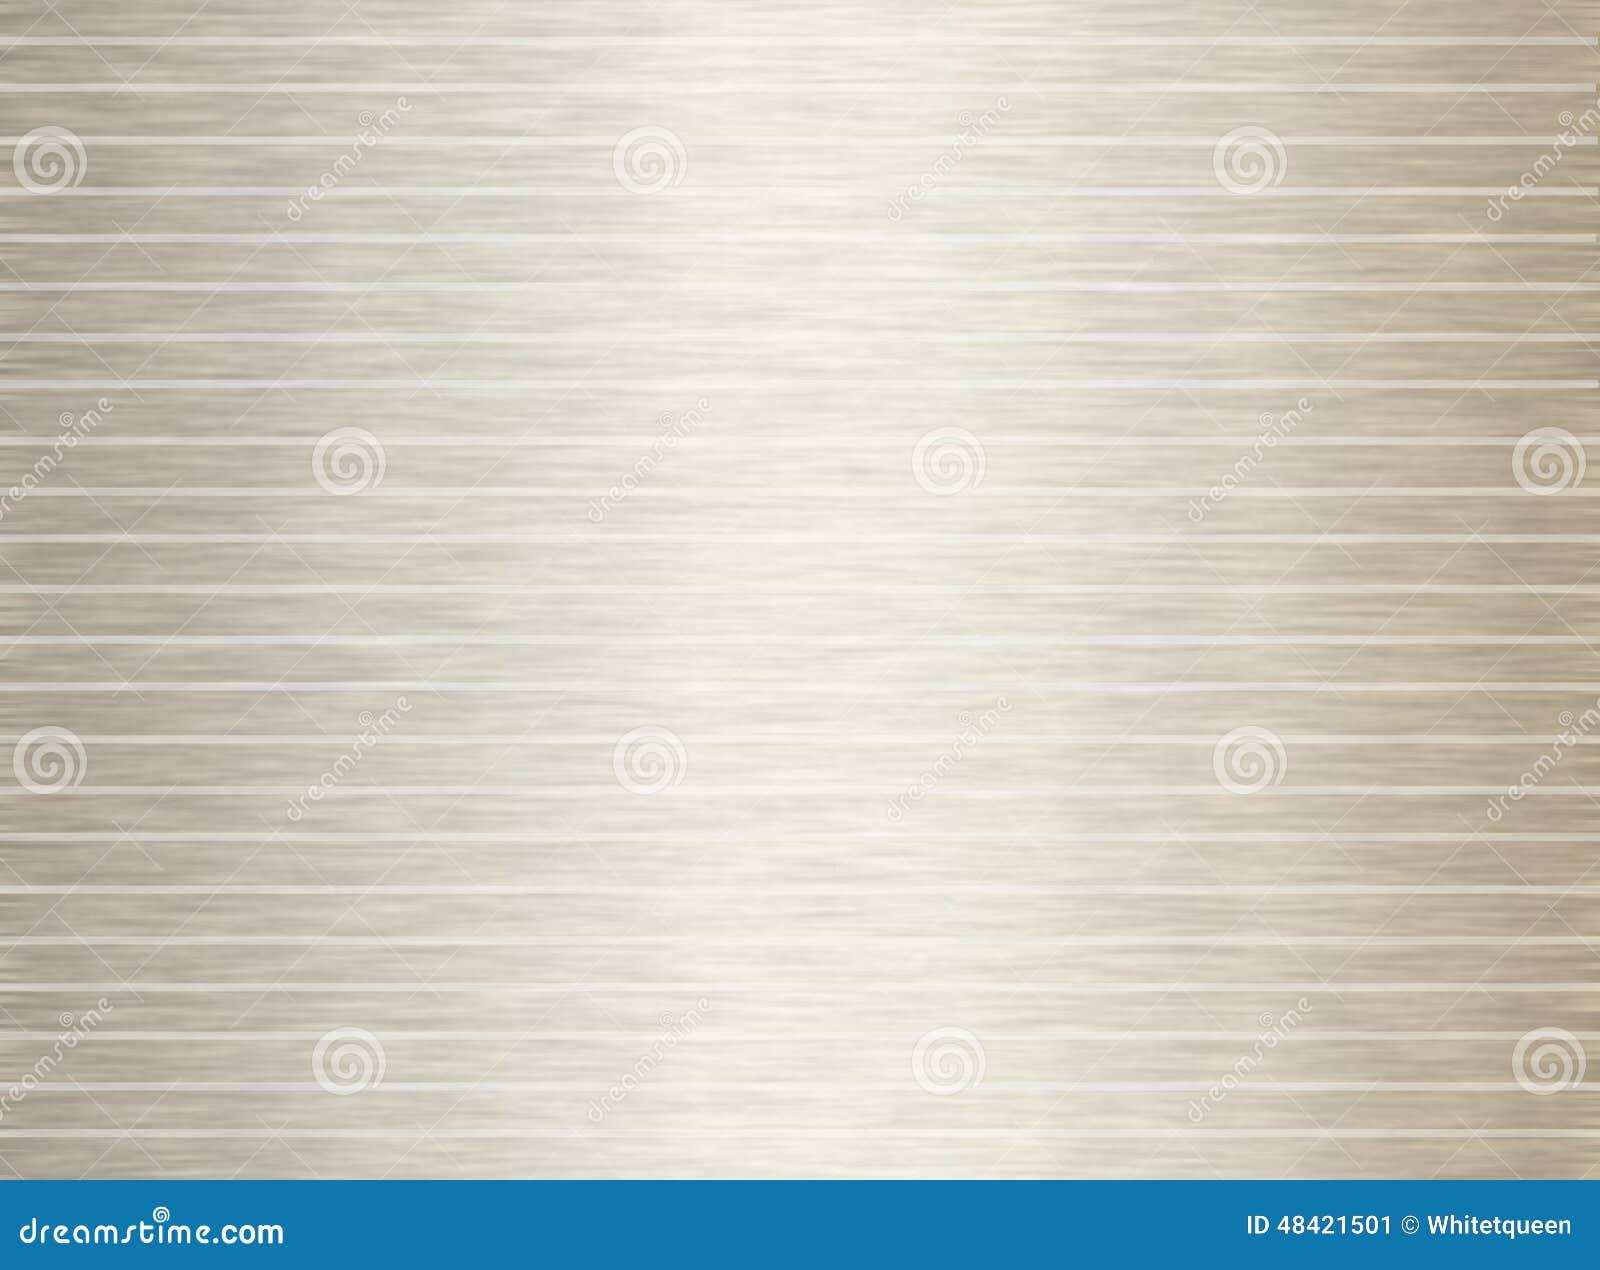 web backgrounds and textures stock image image of bark elegant